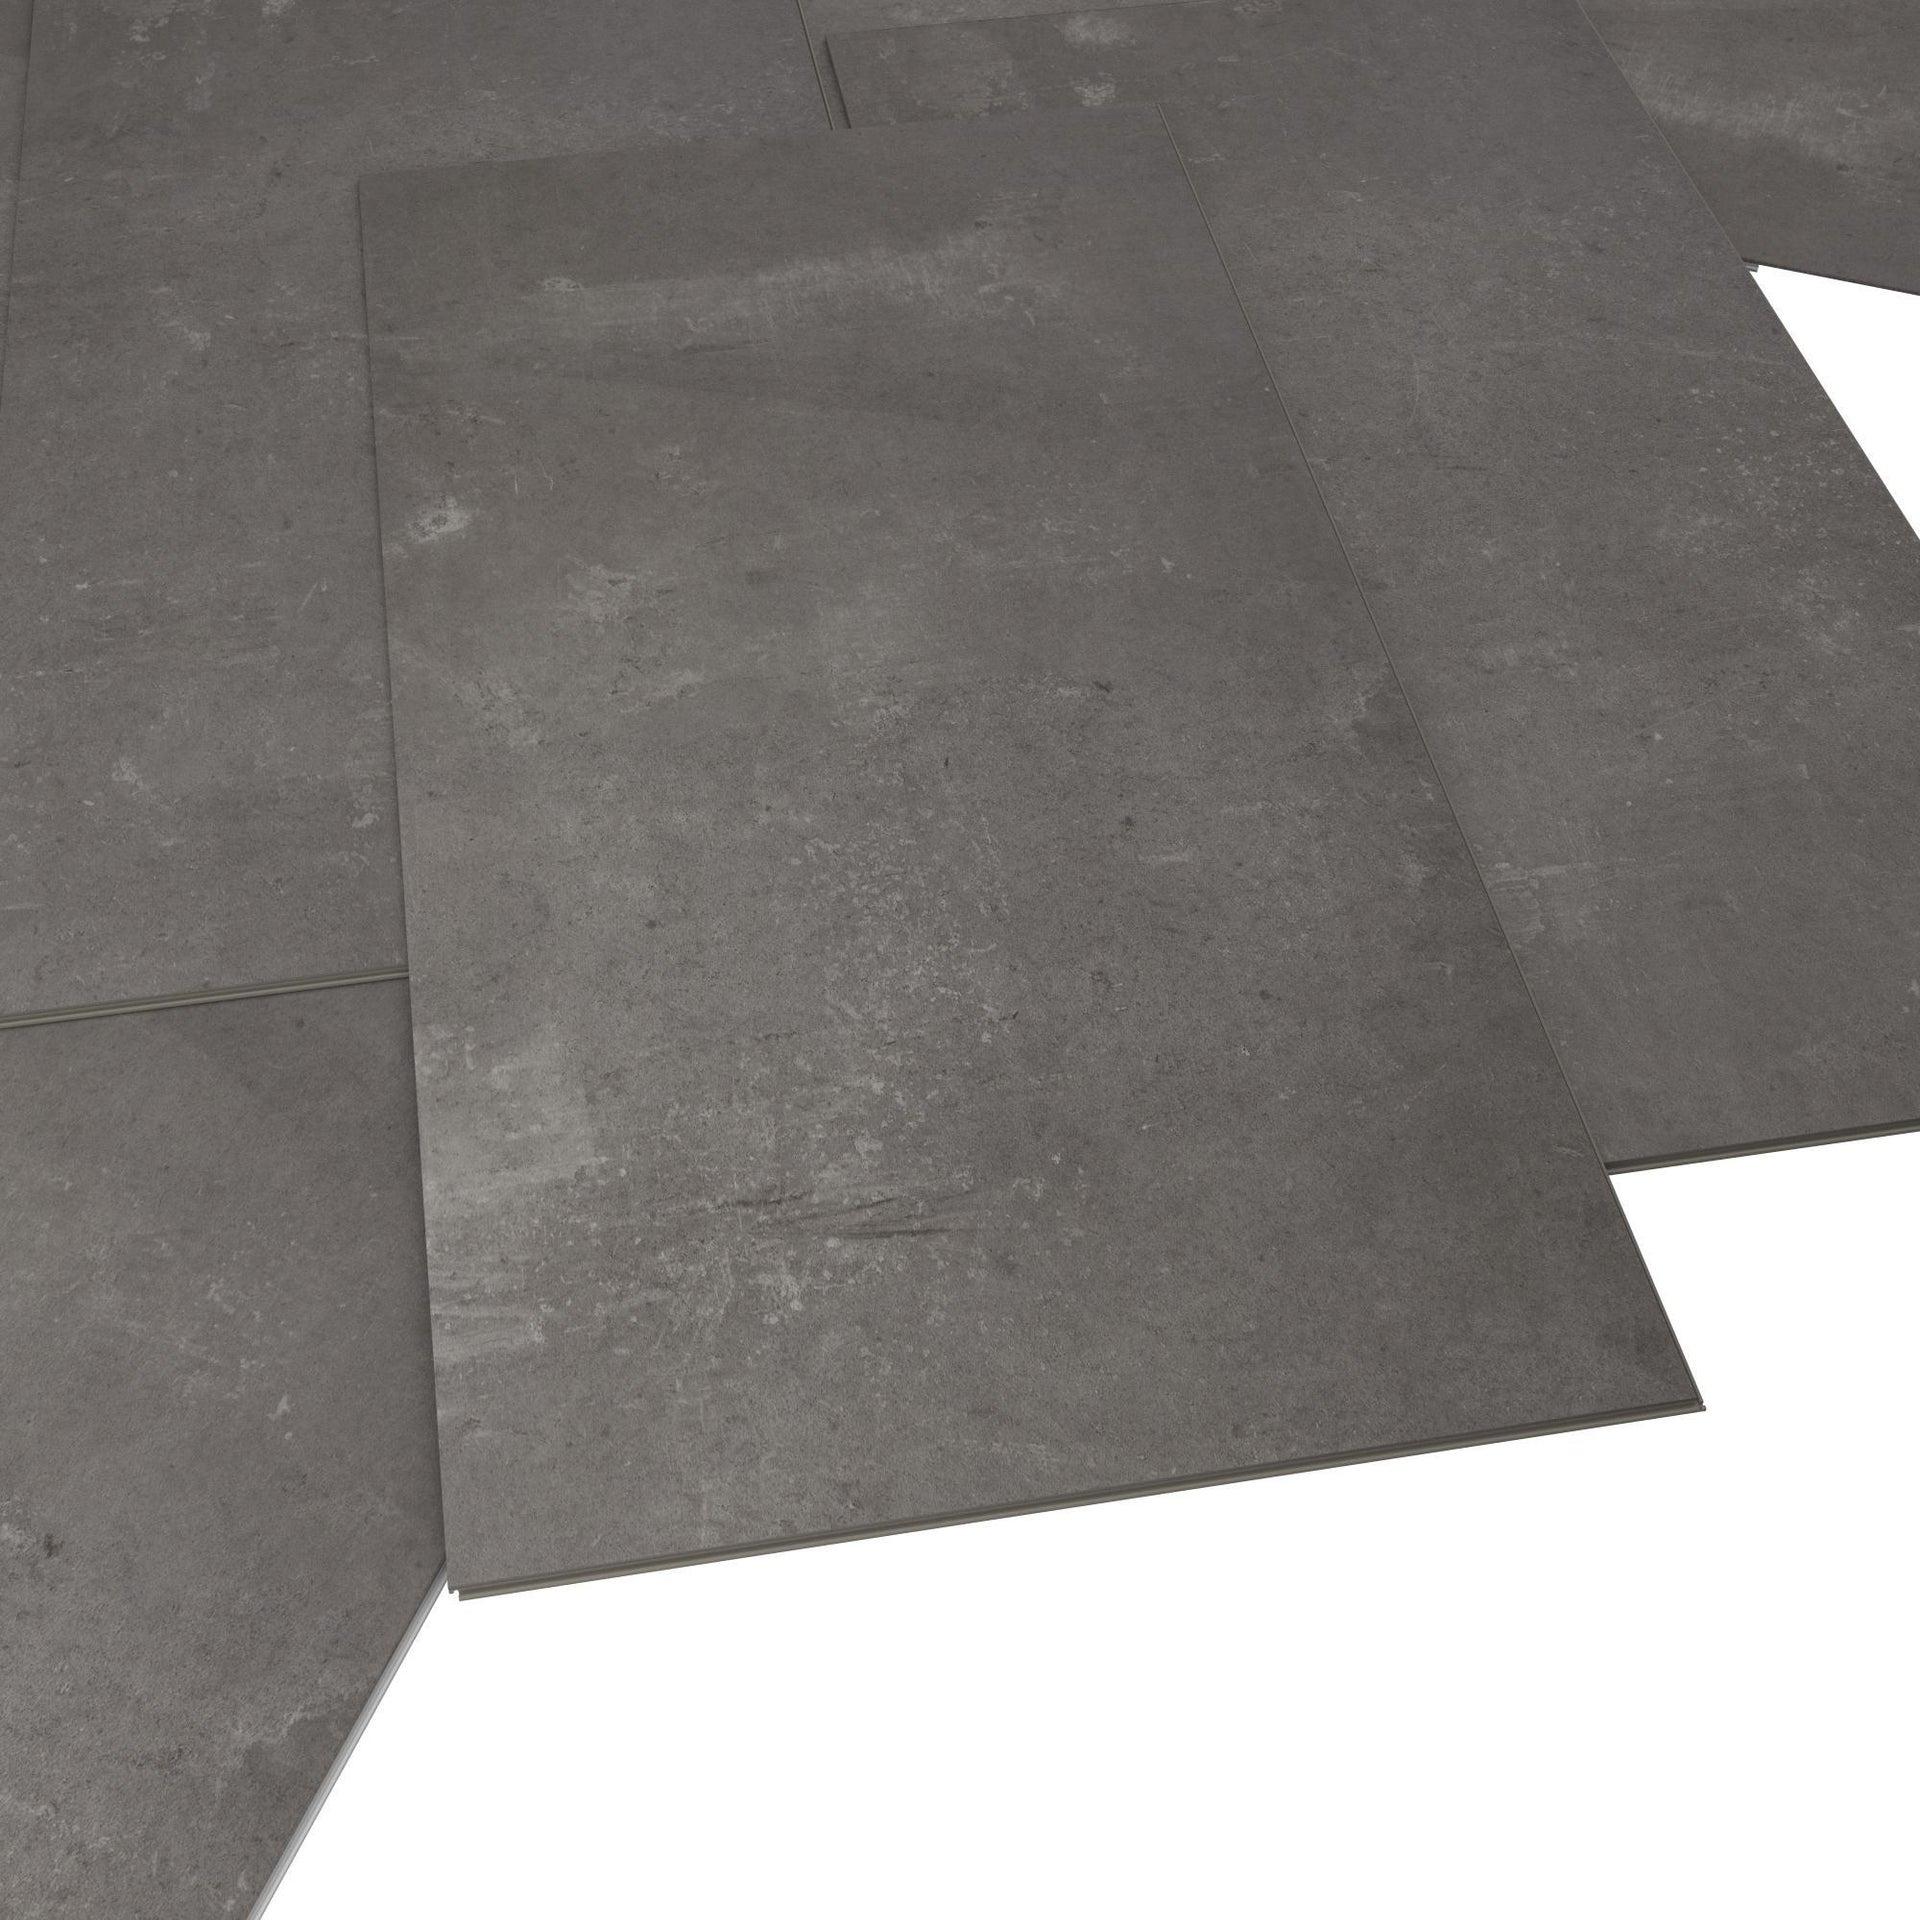 Pavimento PVC flottante clic+ Juke Sp 5 mm grigio / argento - 4